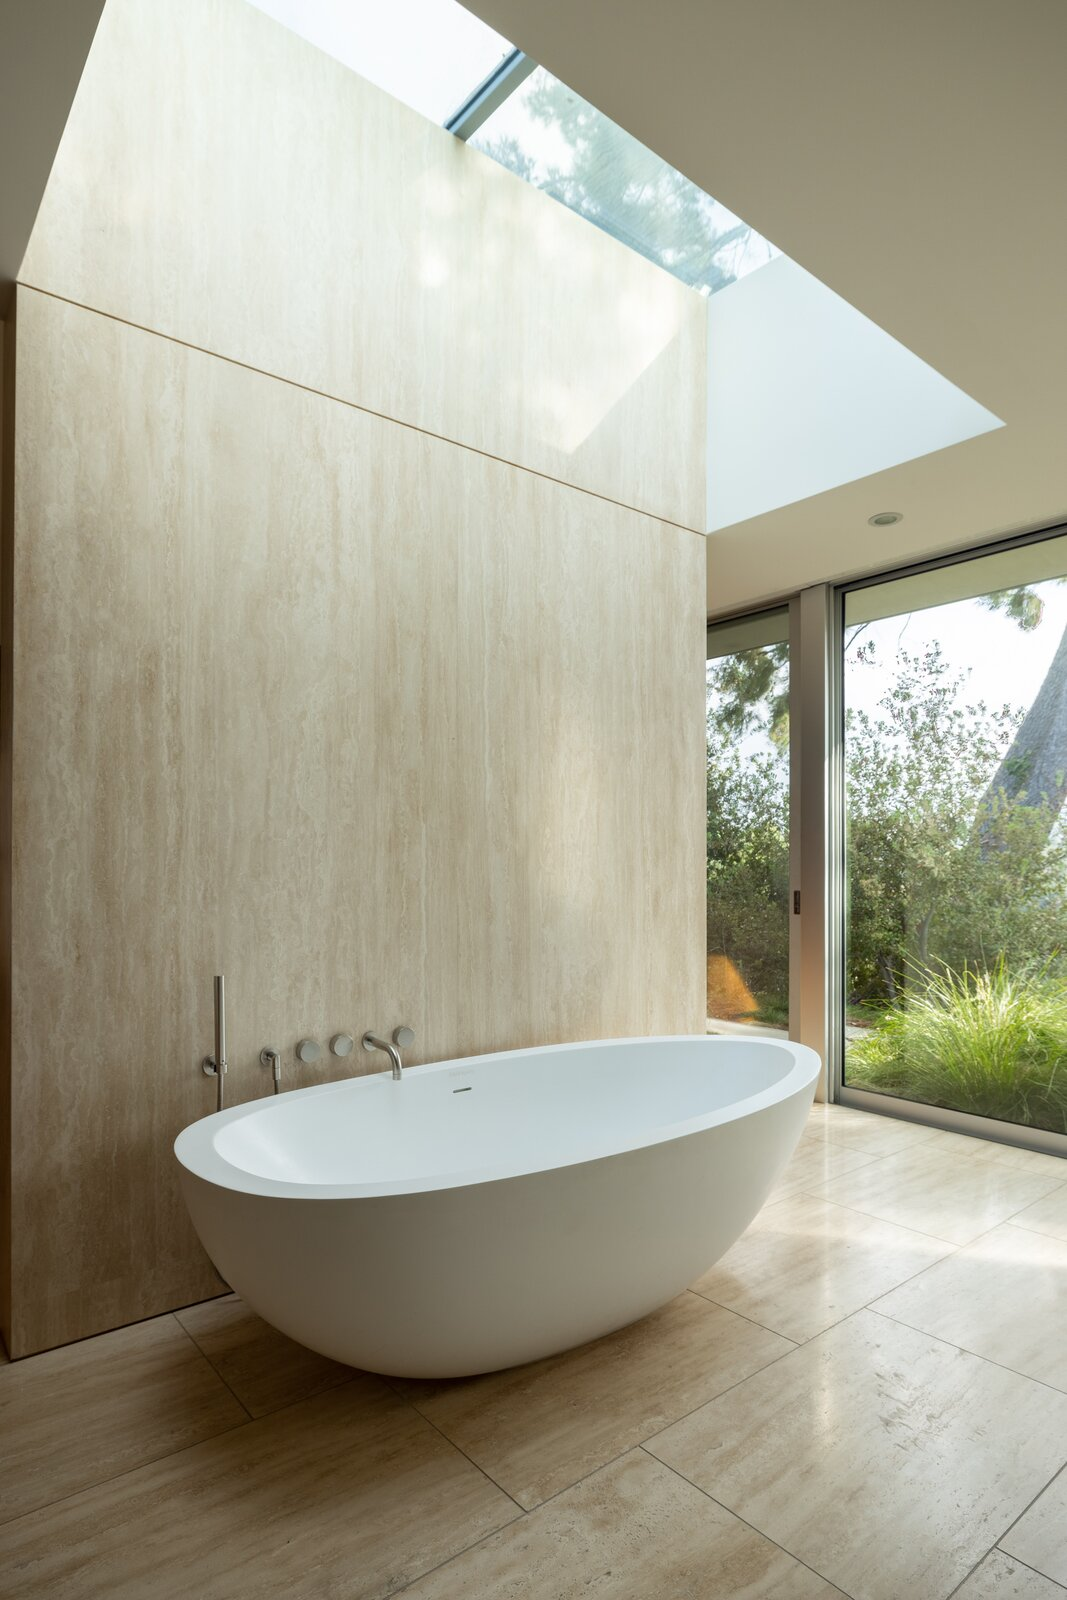 Bathroom of Clear Oak Residence by Woods & Dangaran Architects